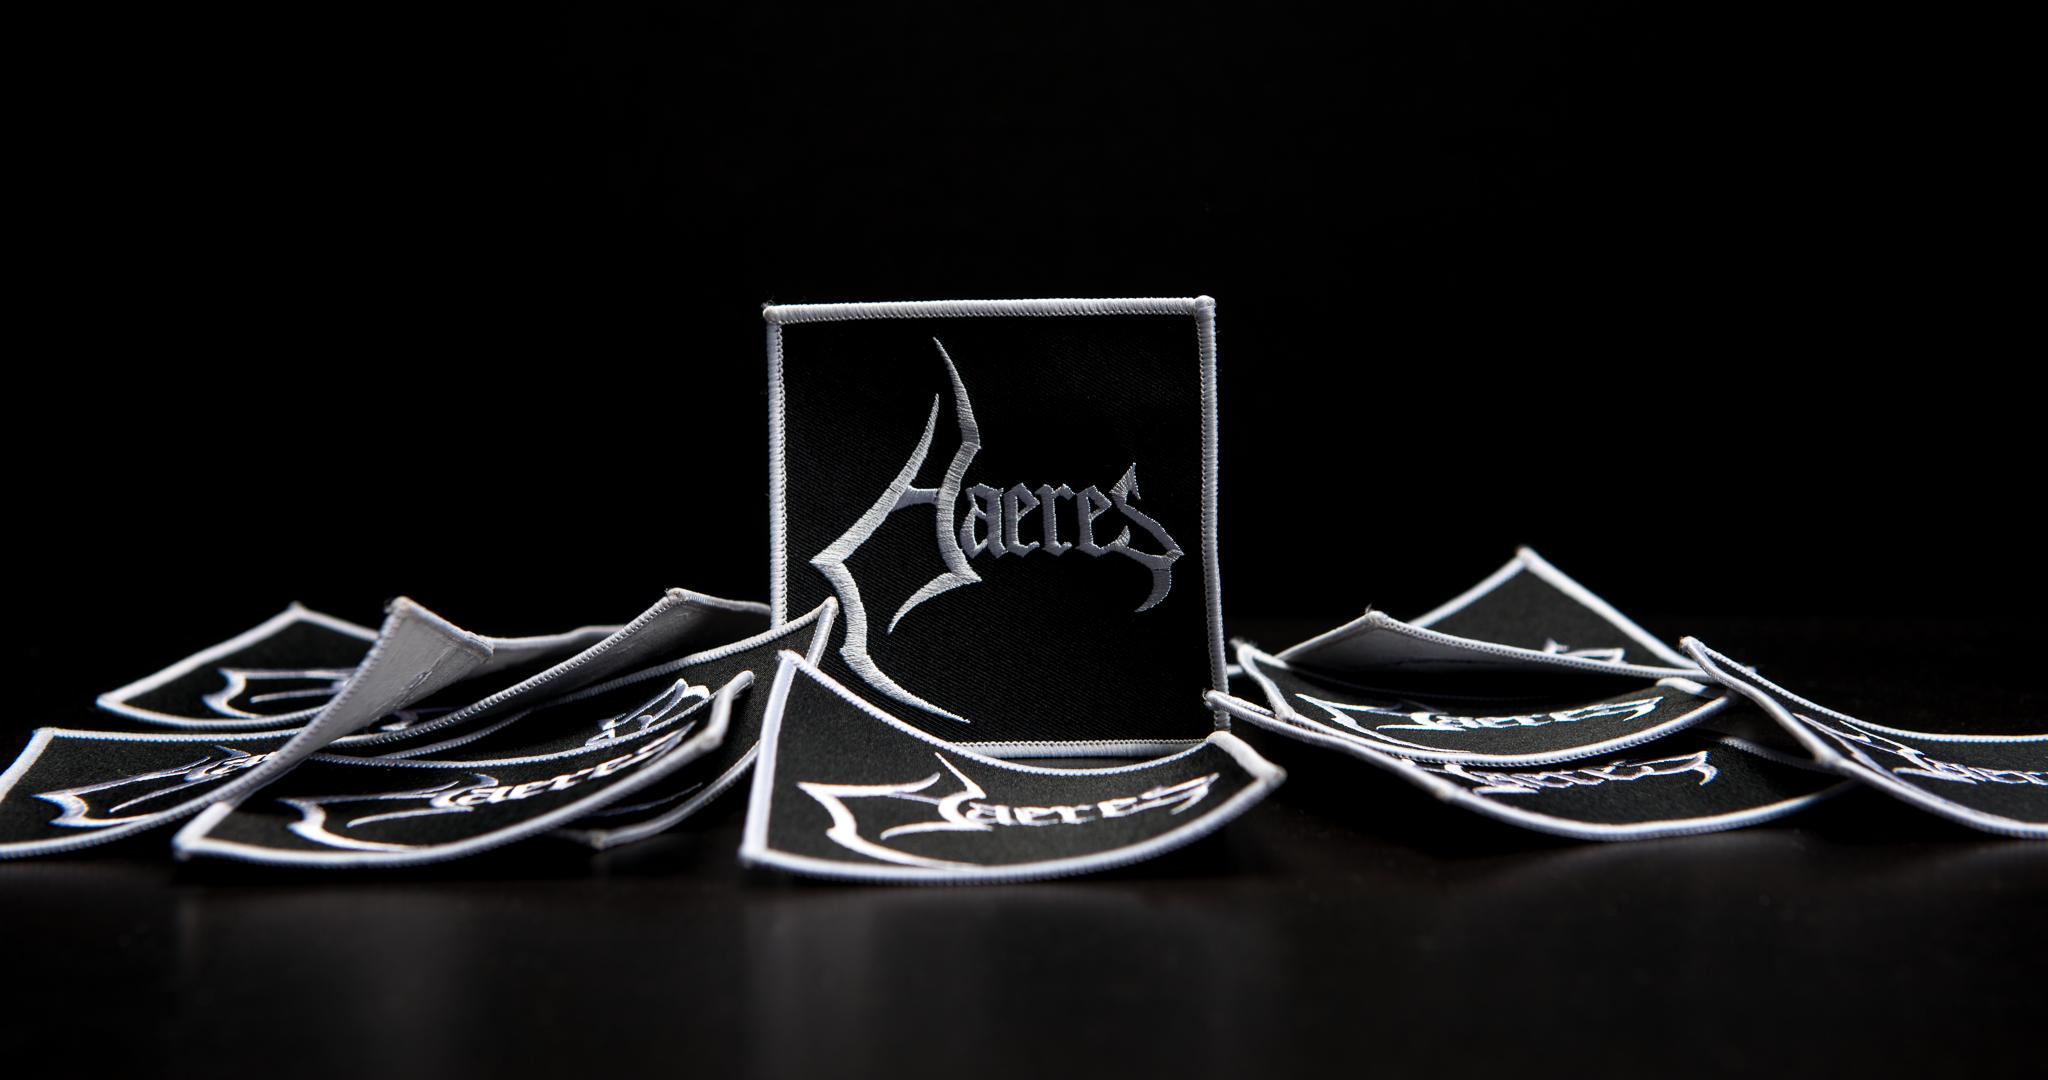 Haeres - Logo Patch